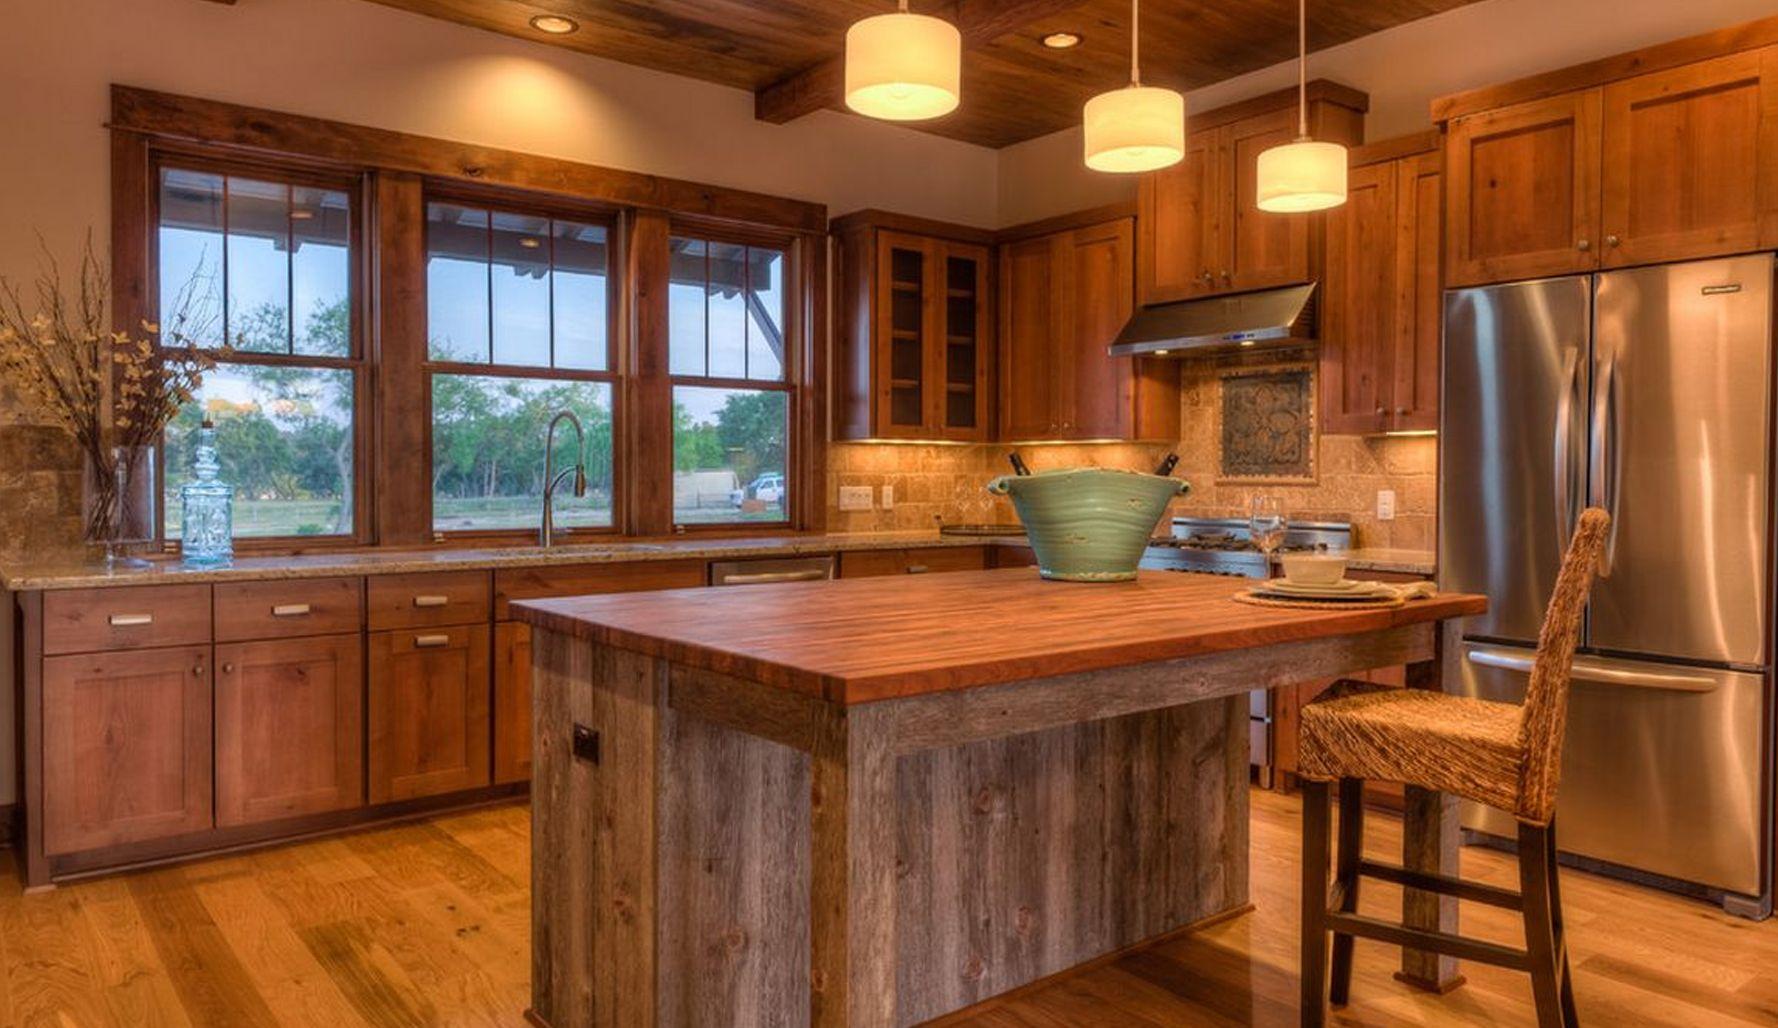 Cocina r stica de madera caba as pinterest cocinas - Muebles de madera rusticos para cocina ...